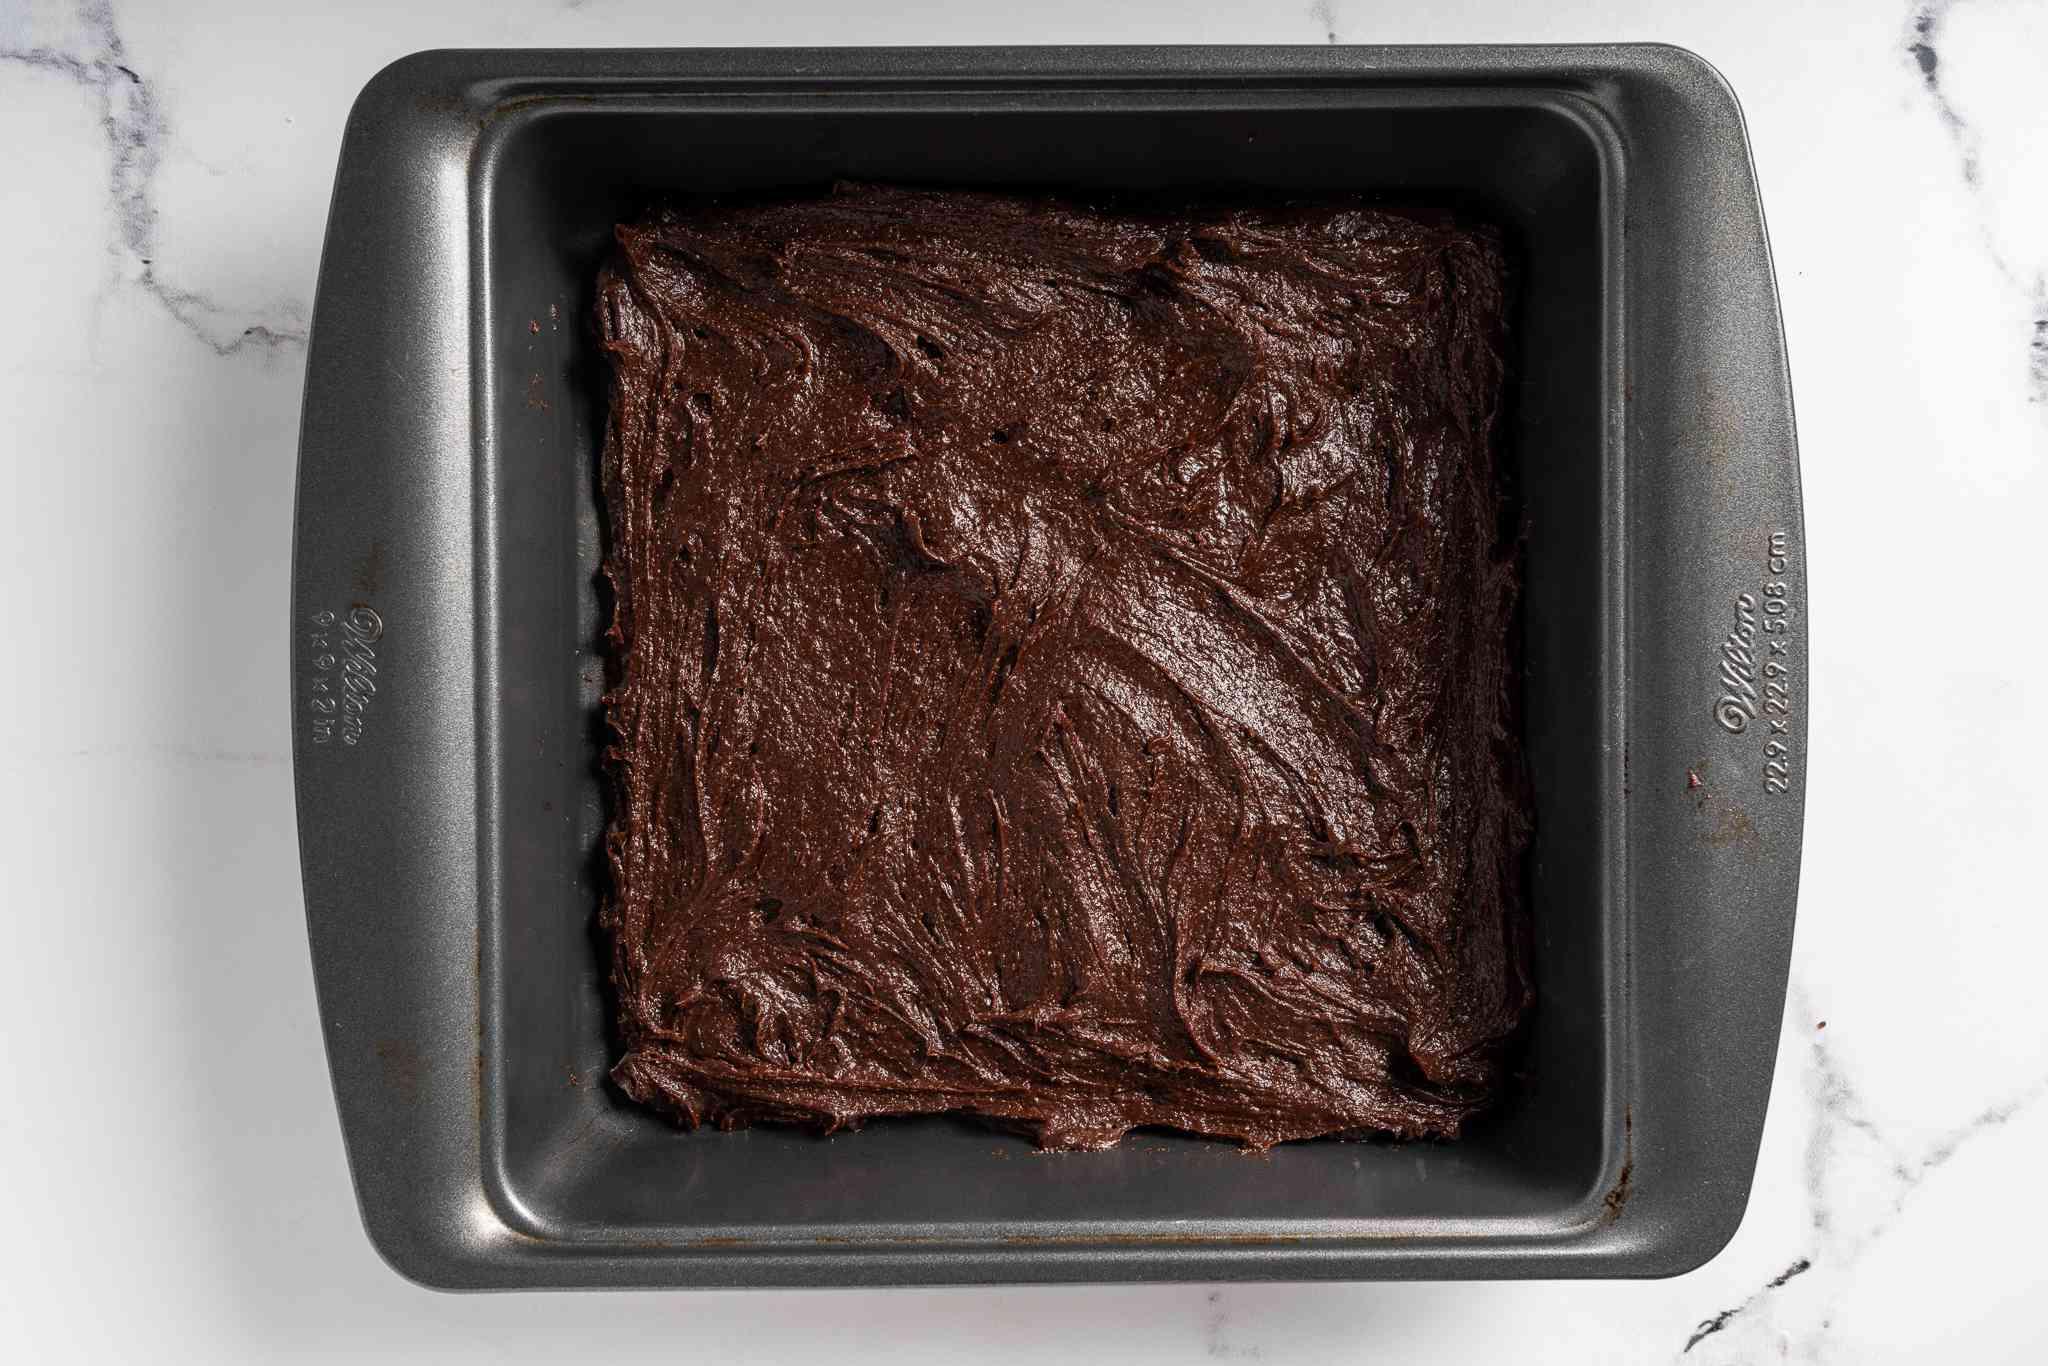 Boozy Brownies batter in a baking pan